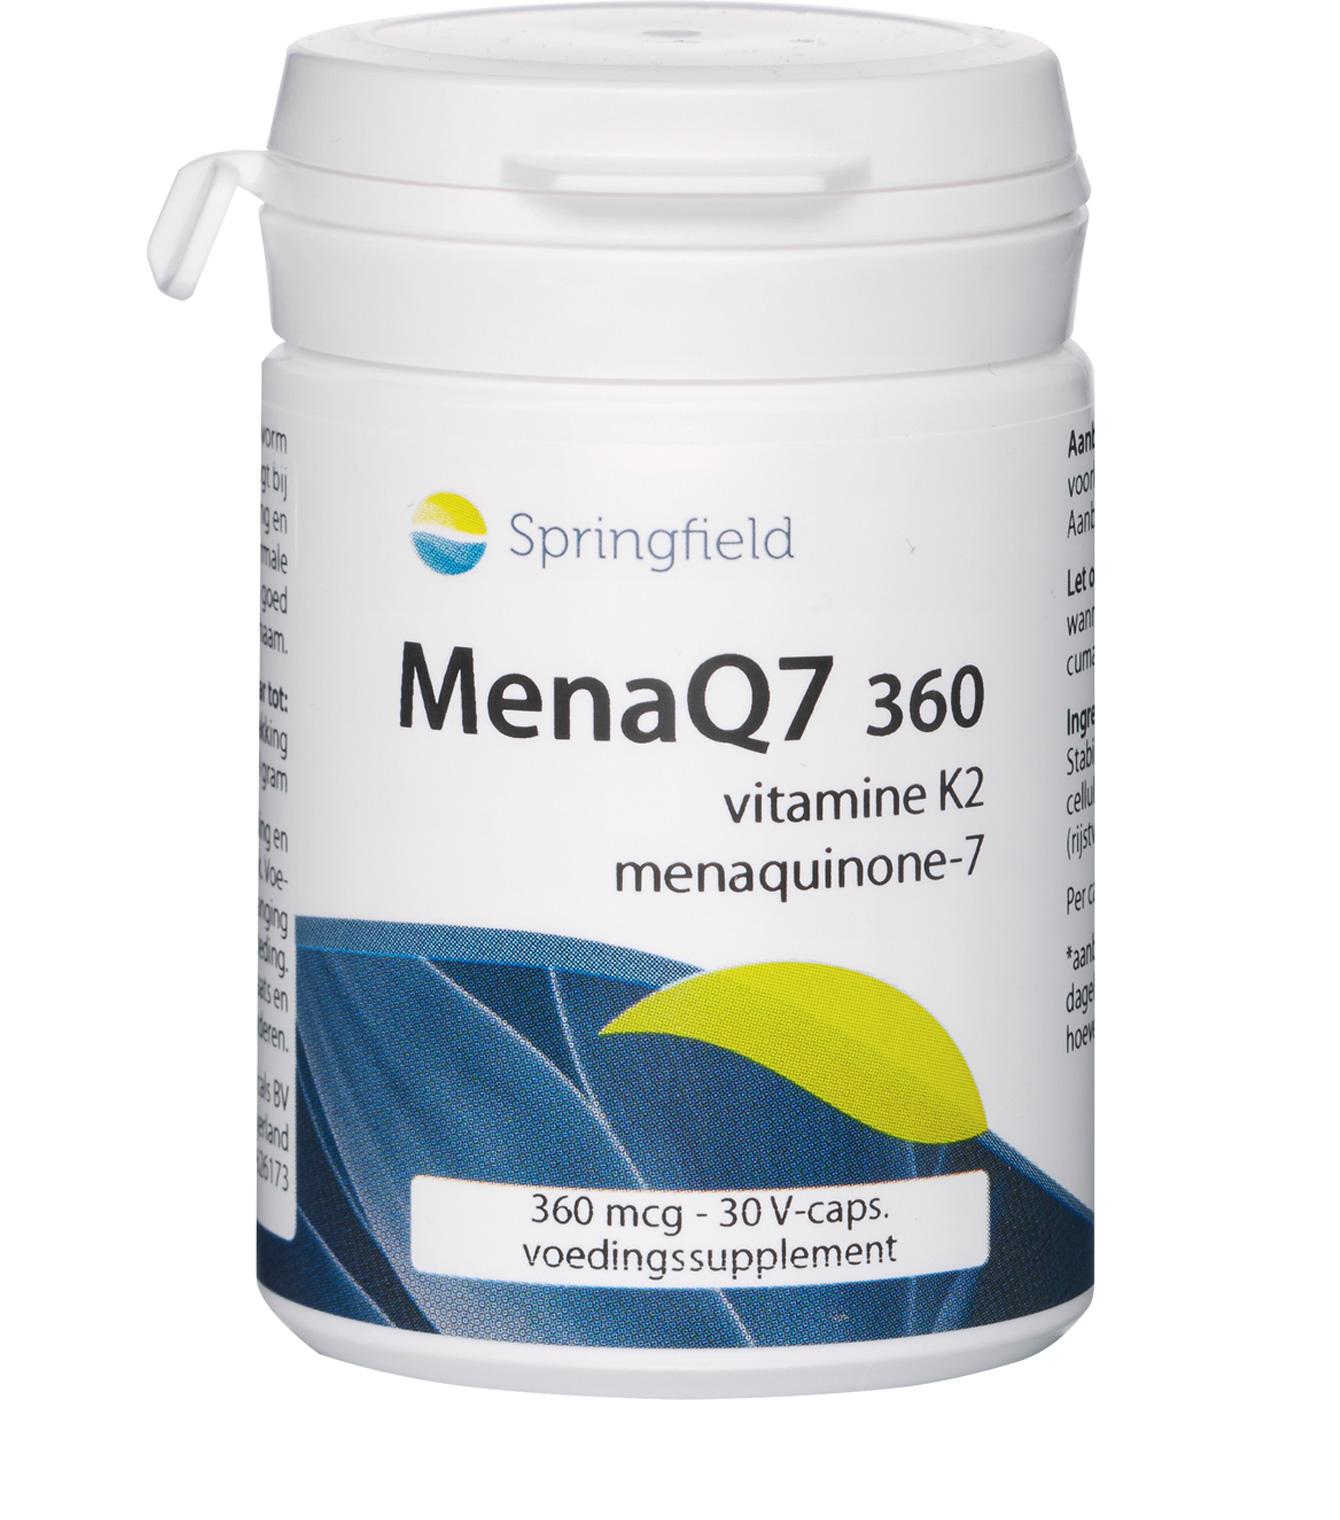 MenaQ7 360 Vitamine K2 menaquinone-7